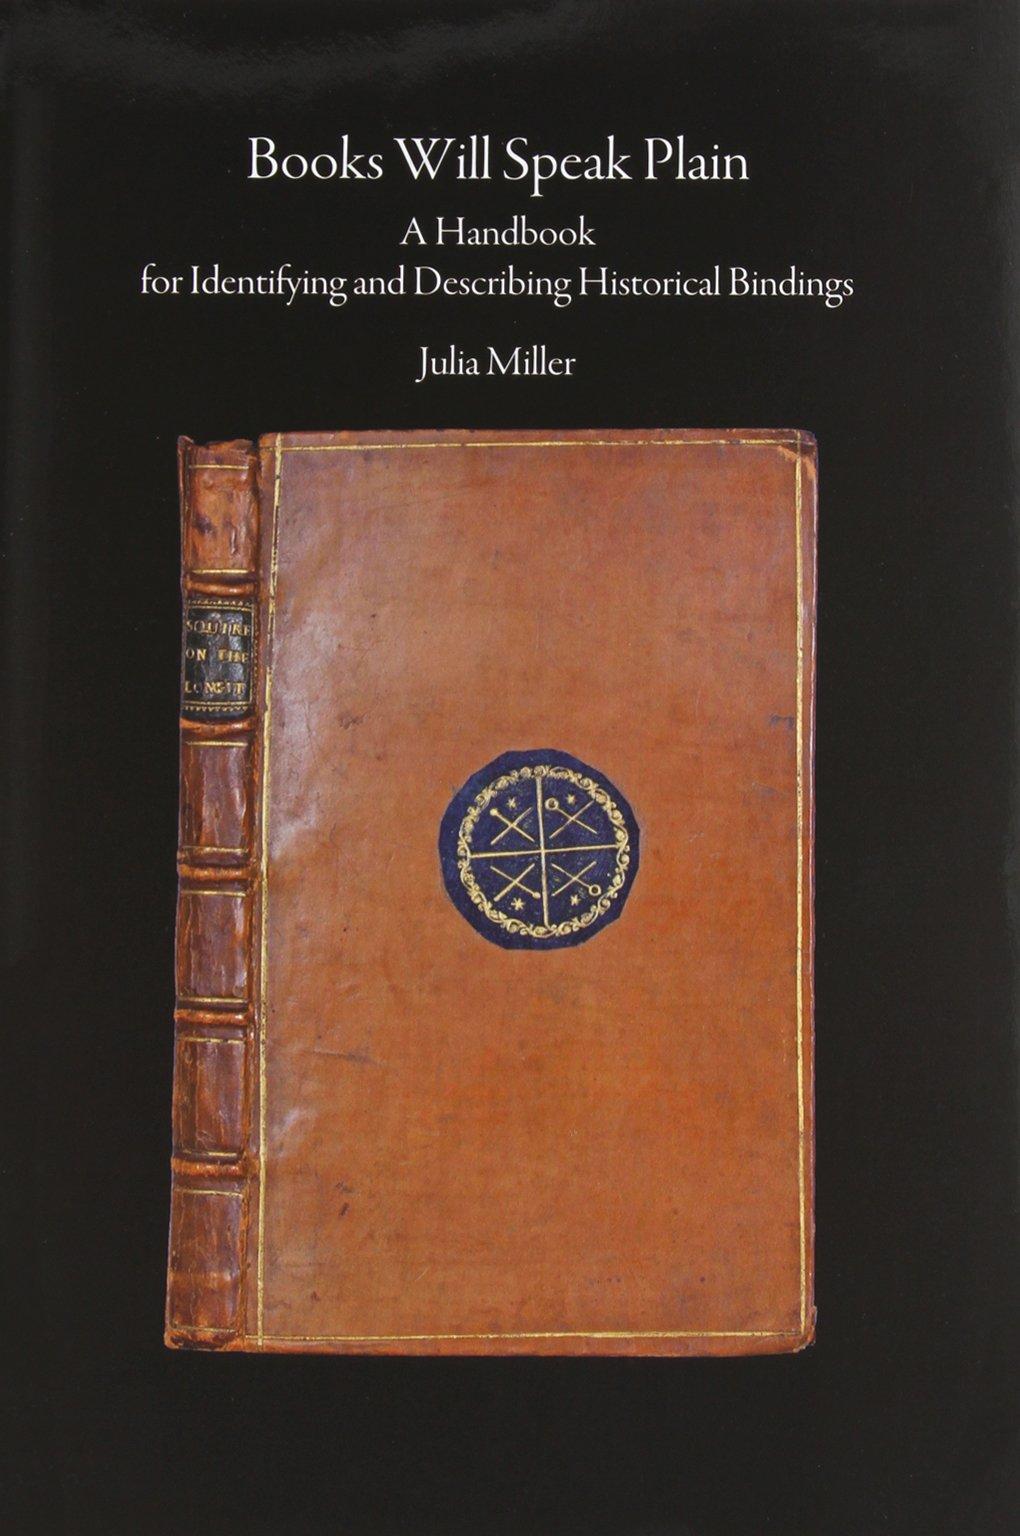 Download Books Will Speak Plain: A Handbook for Identifying and Describing Historical Bindings ebook